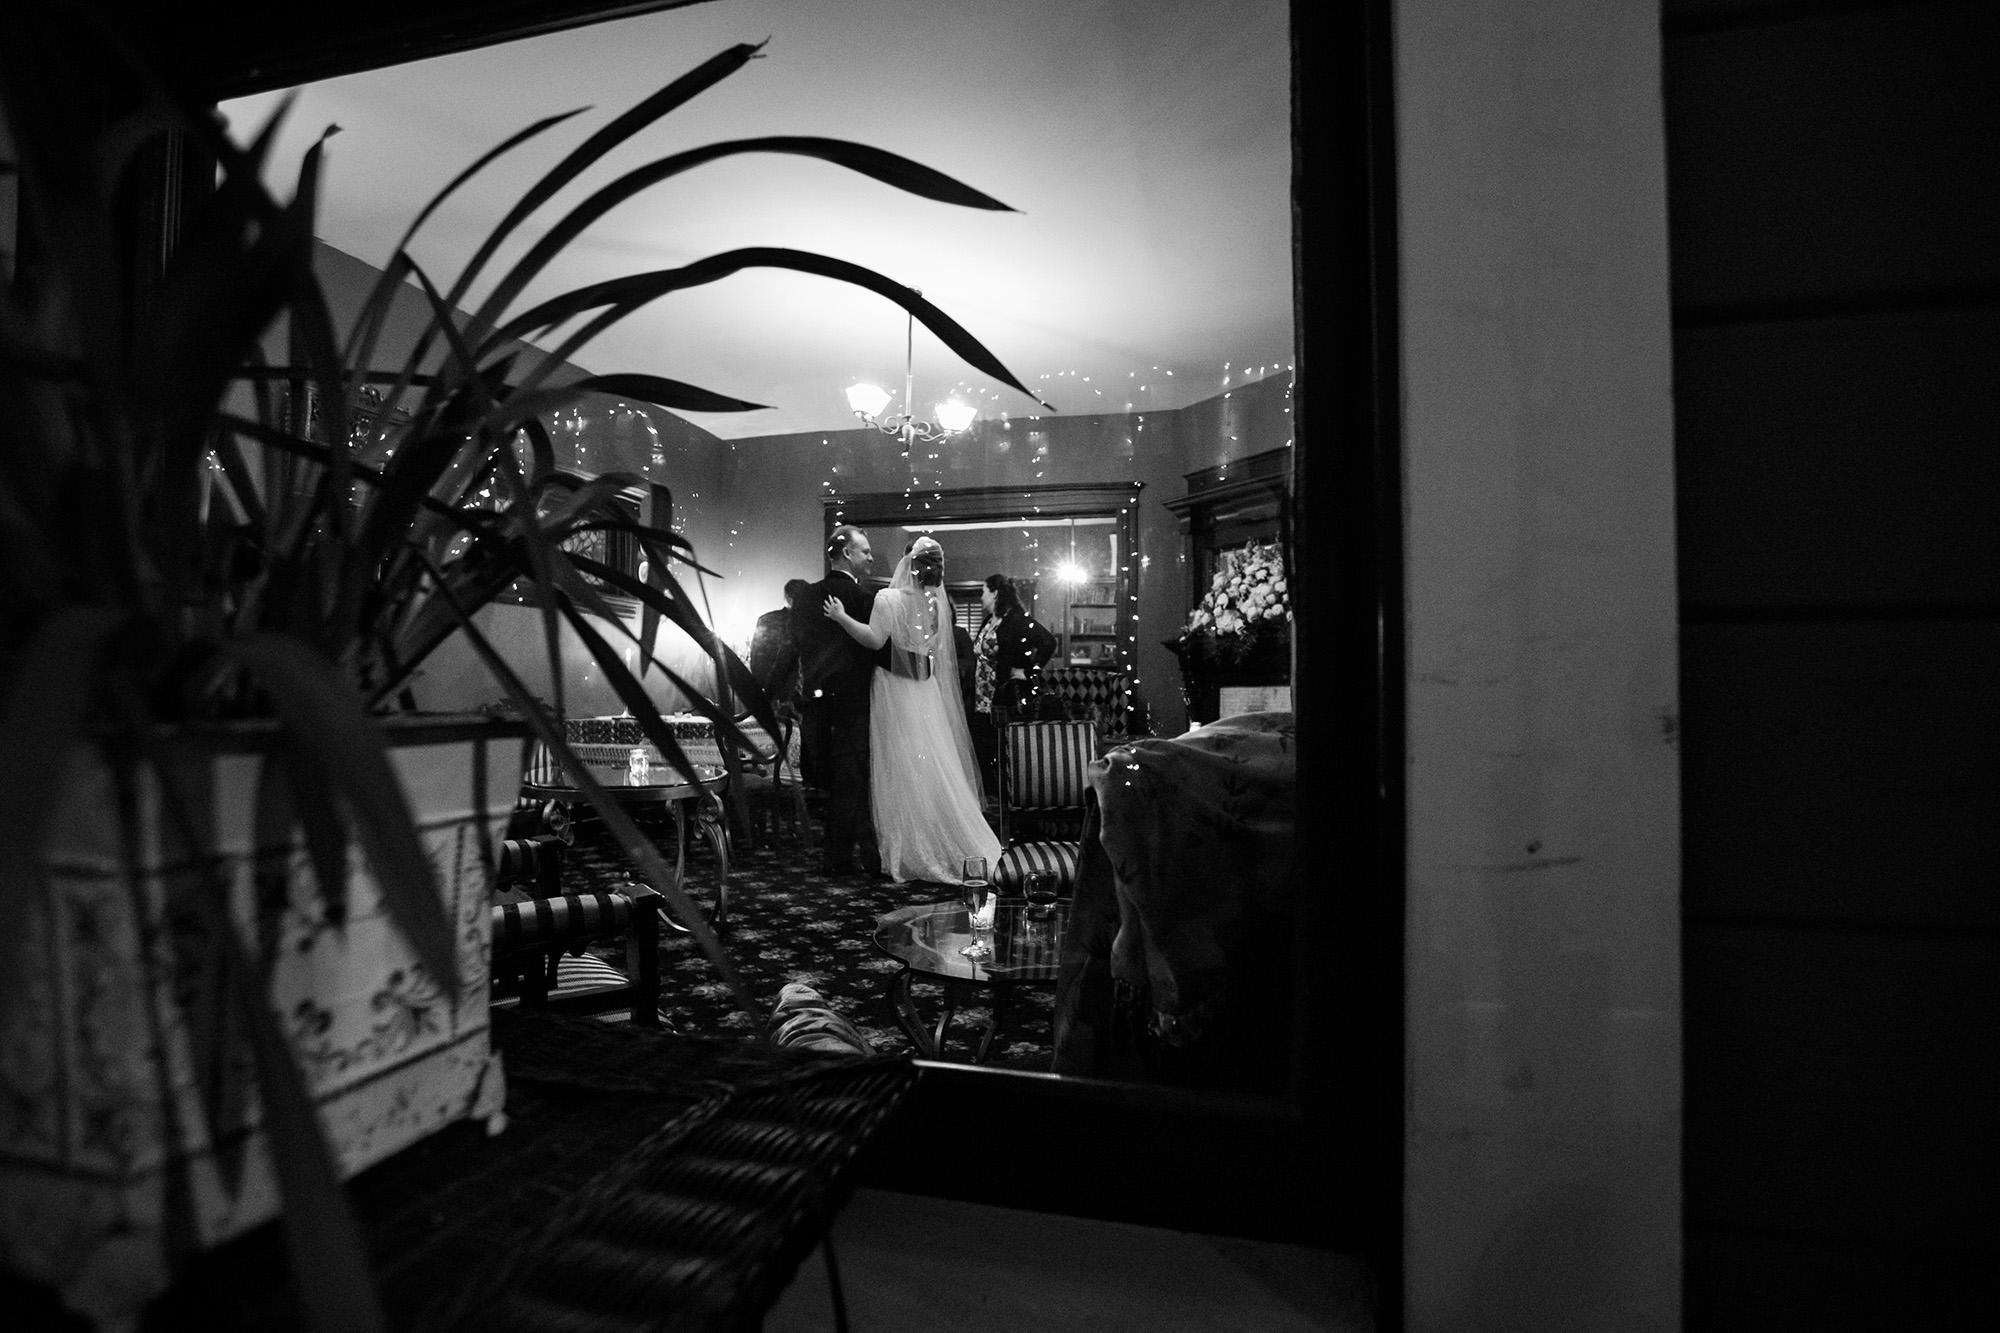 vintage-inspired-christmas-house-wedding-carrie-vines-112.jpg